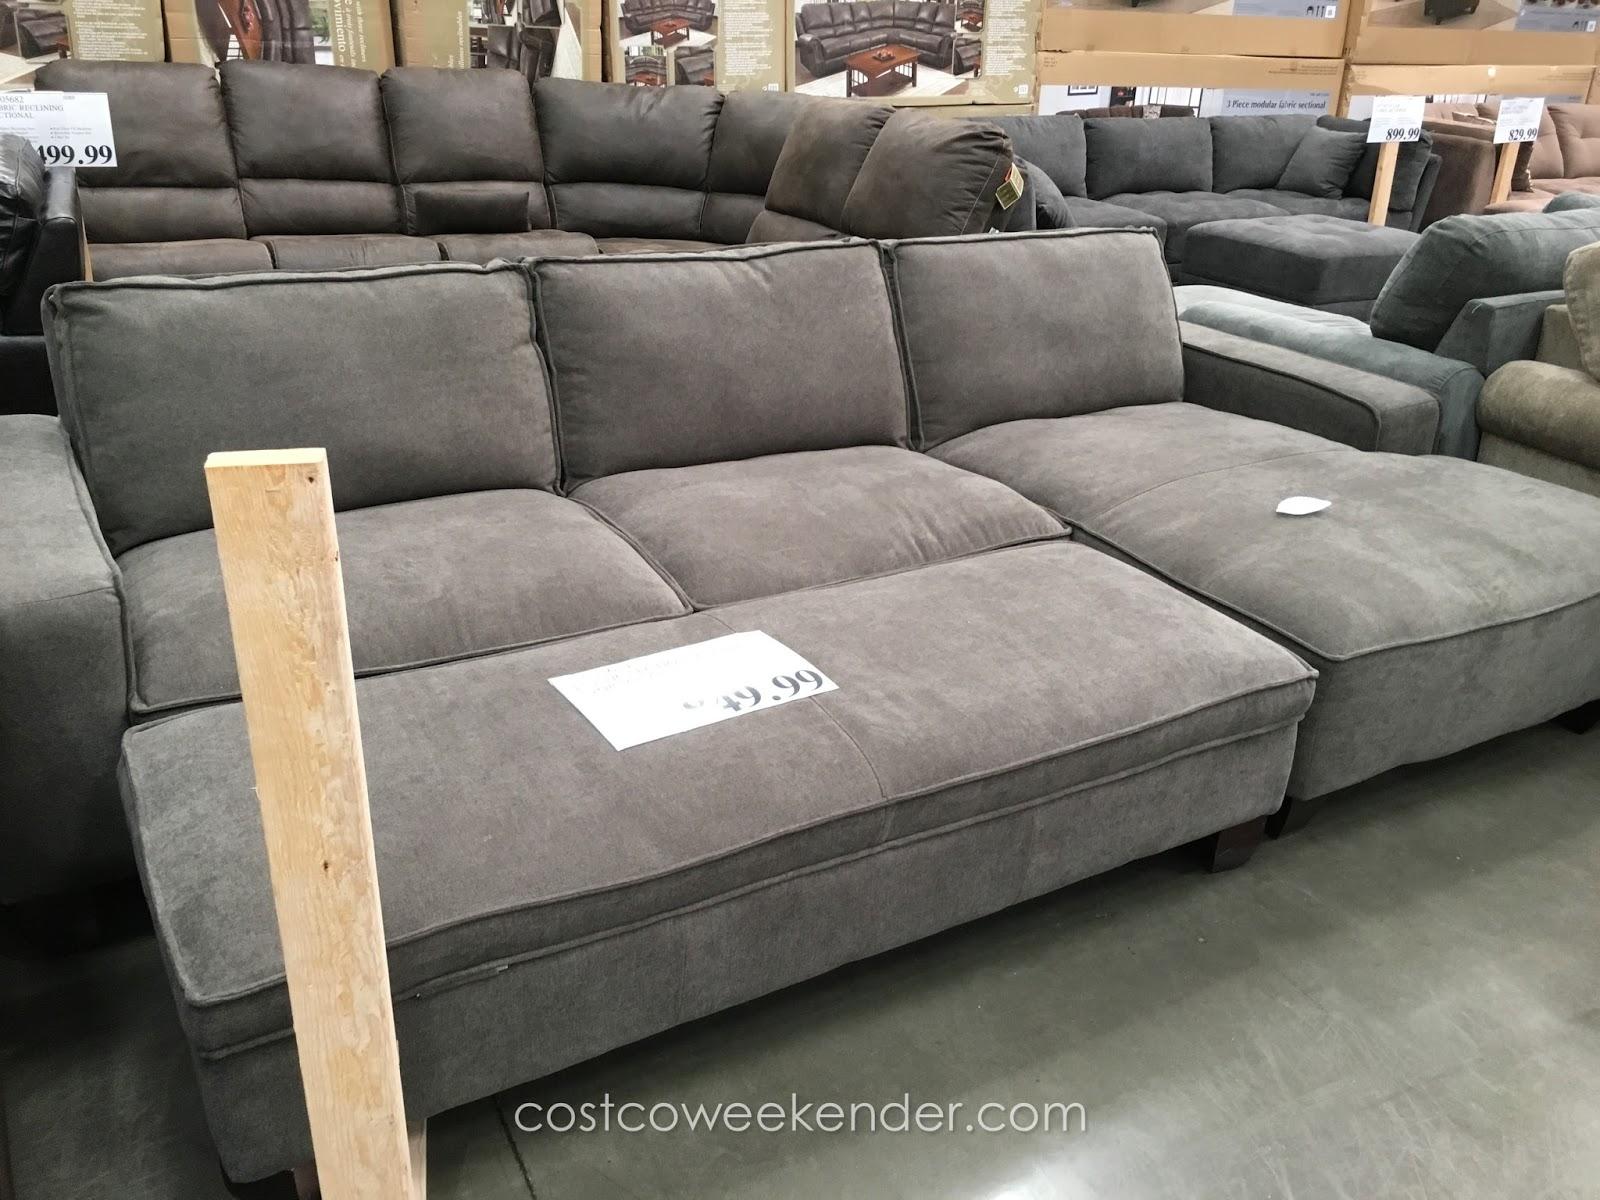 Sofas Center Cosco Reclining Sofas Sofa Costco 2016costco With Regard To Berkline Sofa Recliner (#10 of 12)